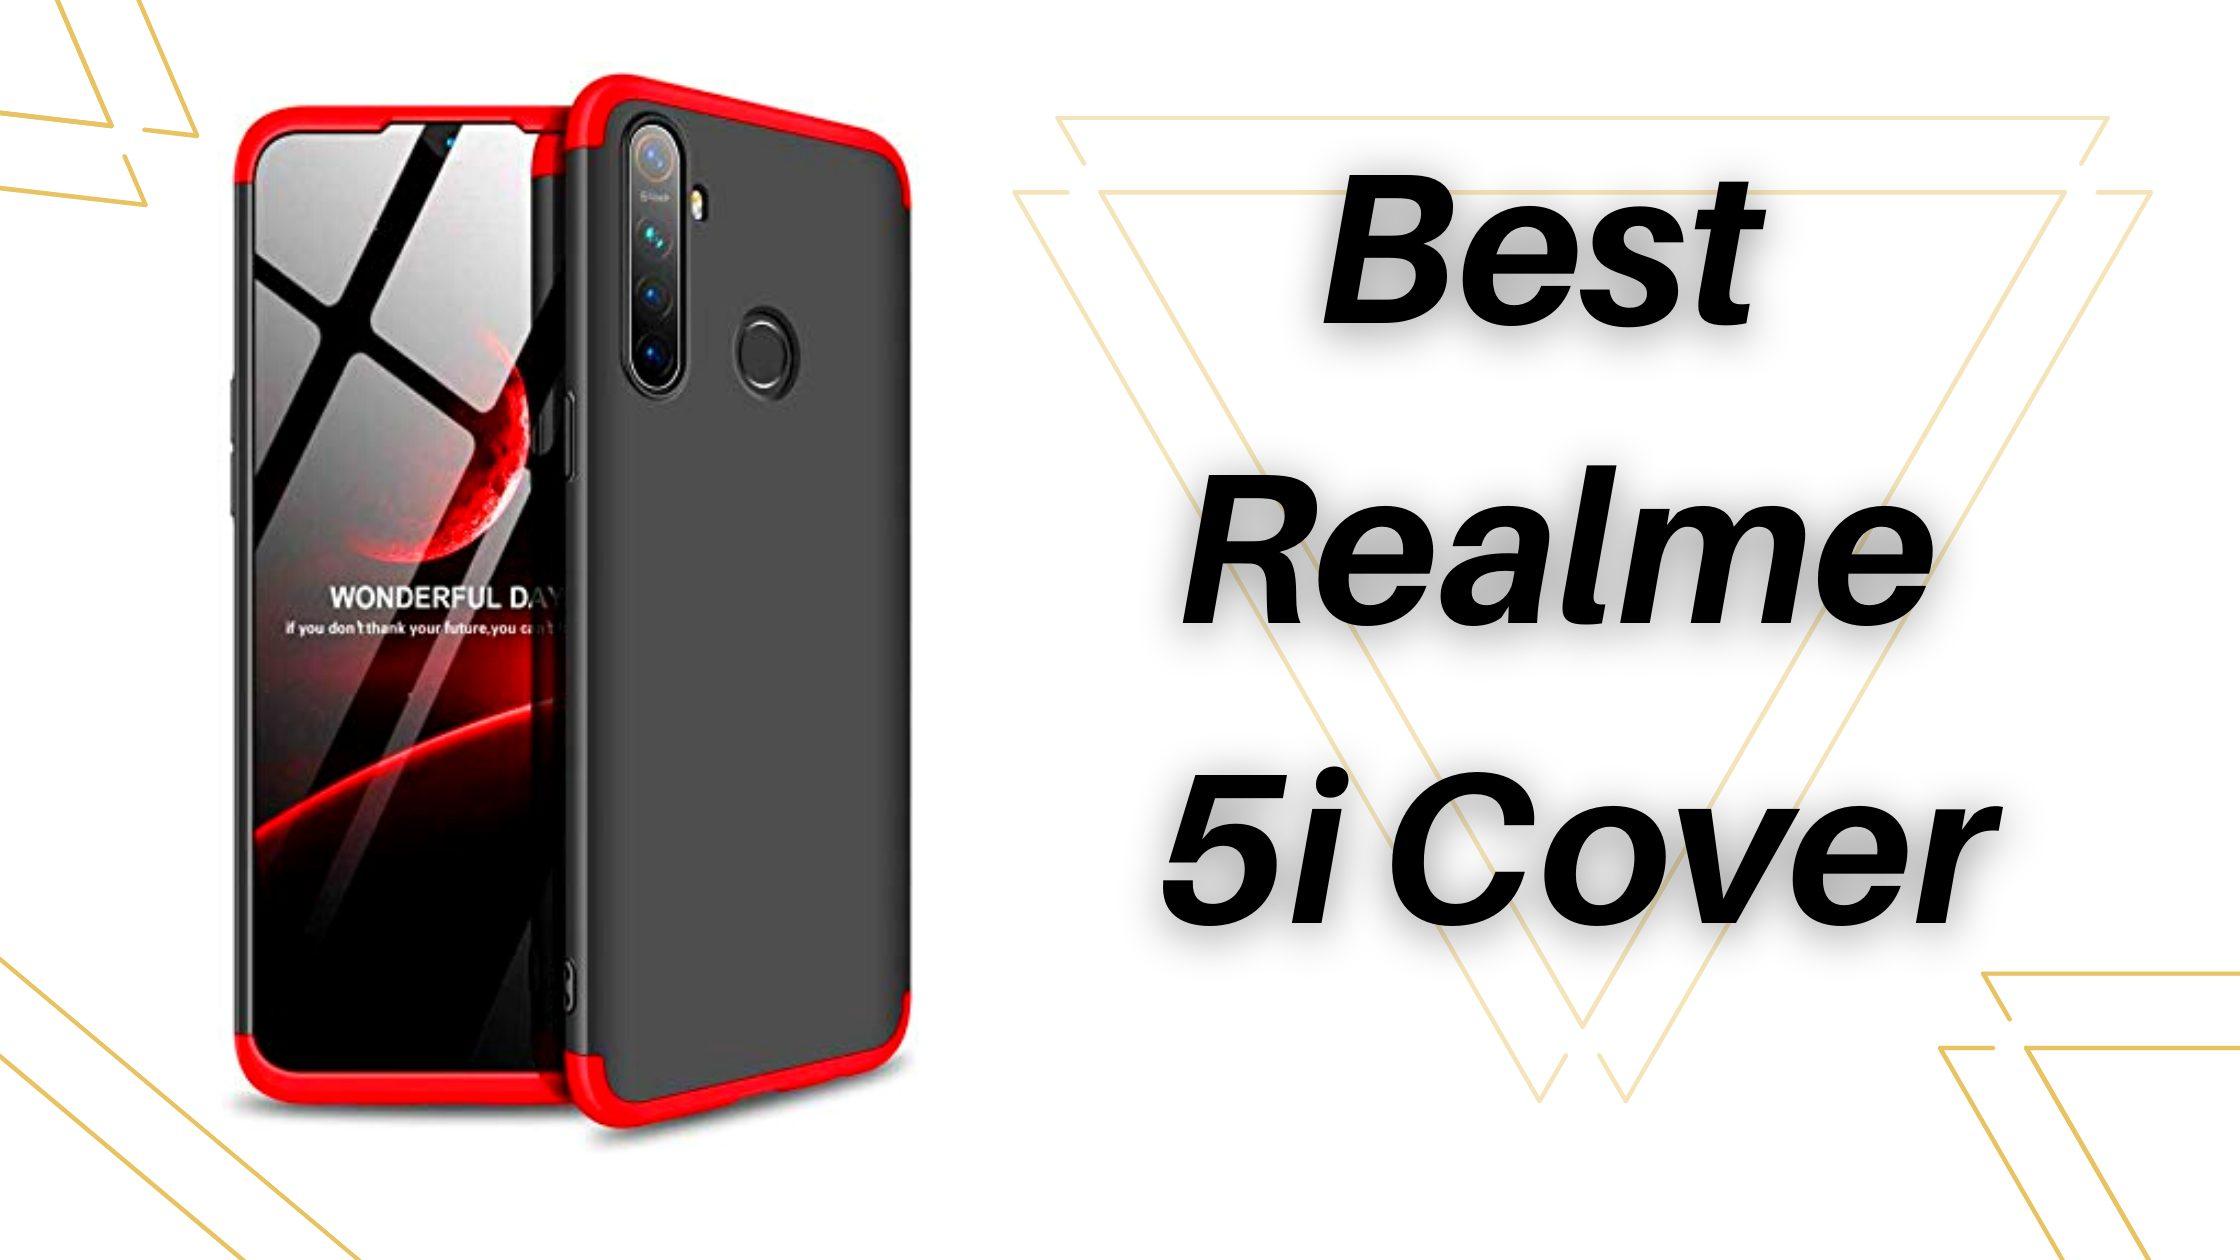 Best Realme 5i Cover